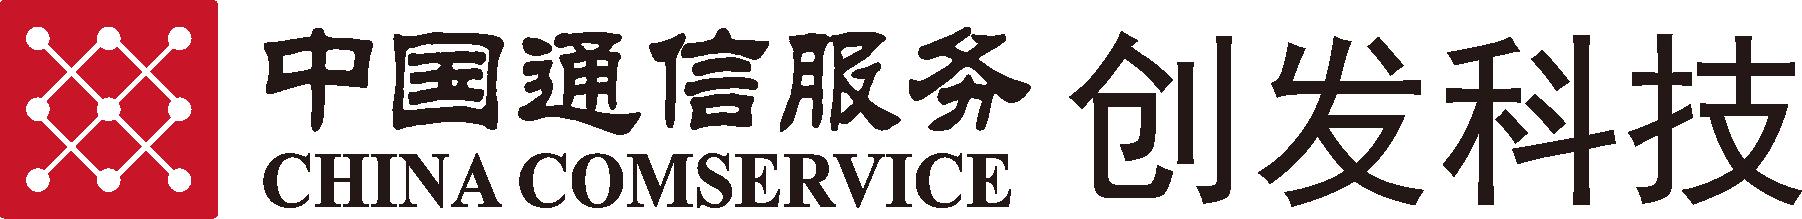 CCS Transfar Technology Co., Ltd.